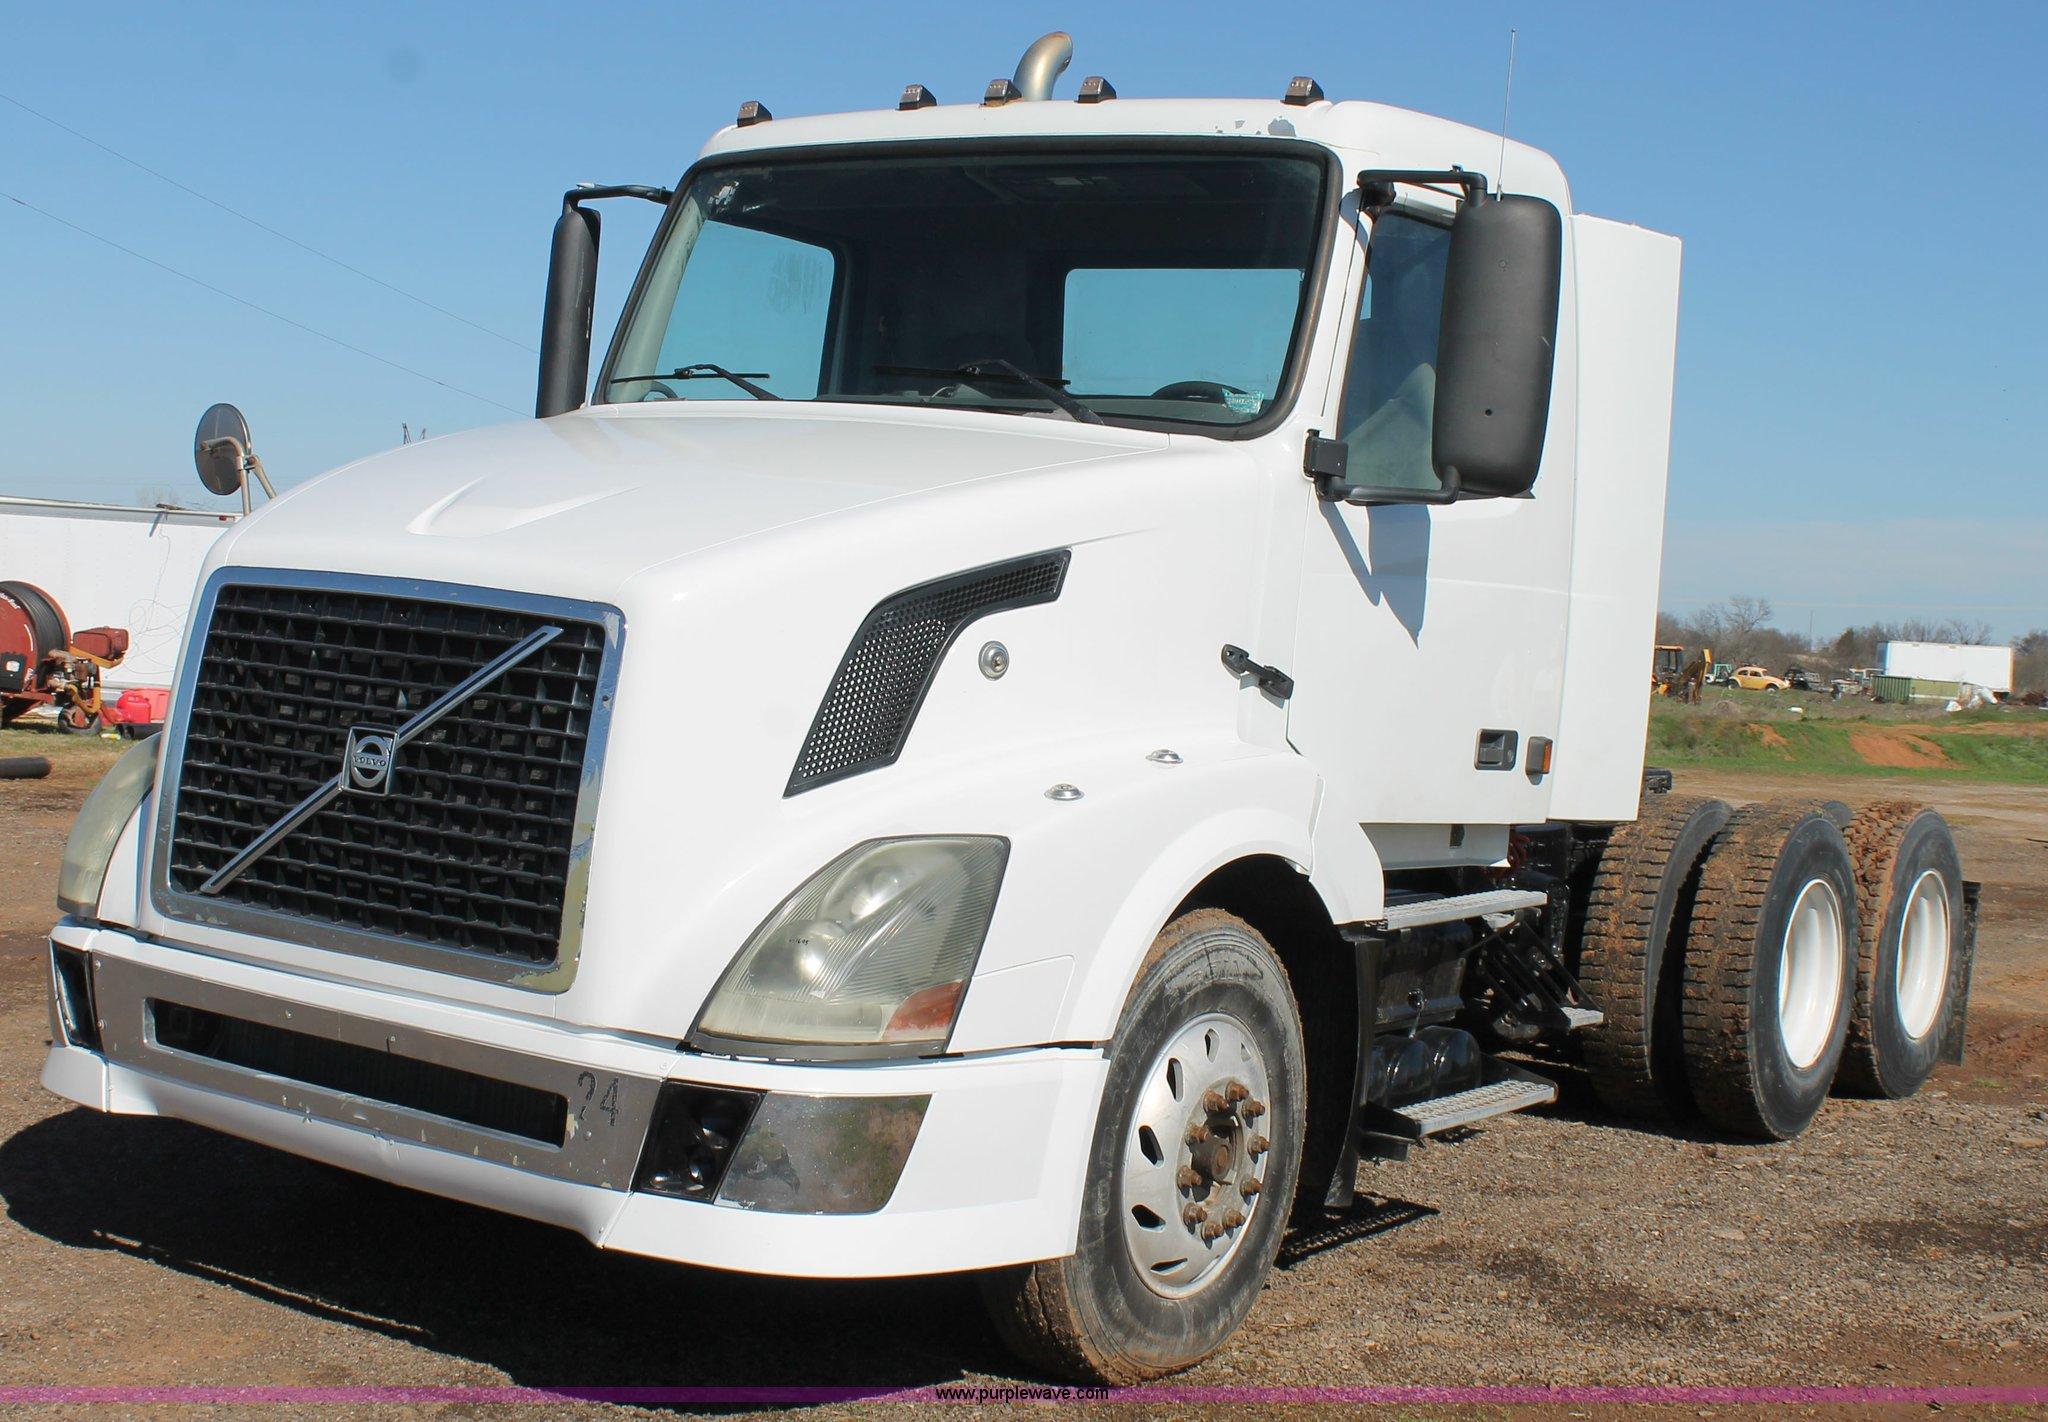 sale new riverside xl image for sales euro stocklist fh globetrotter truck hanbury volvo trucks